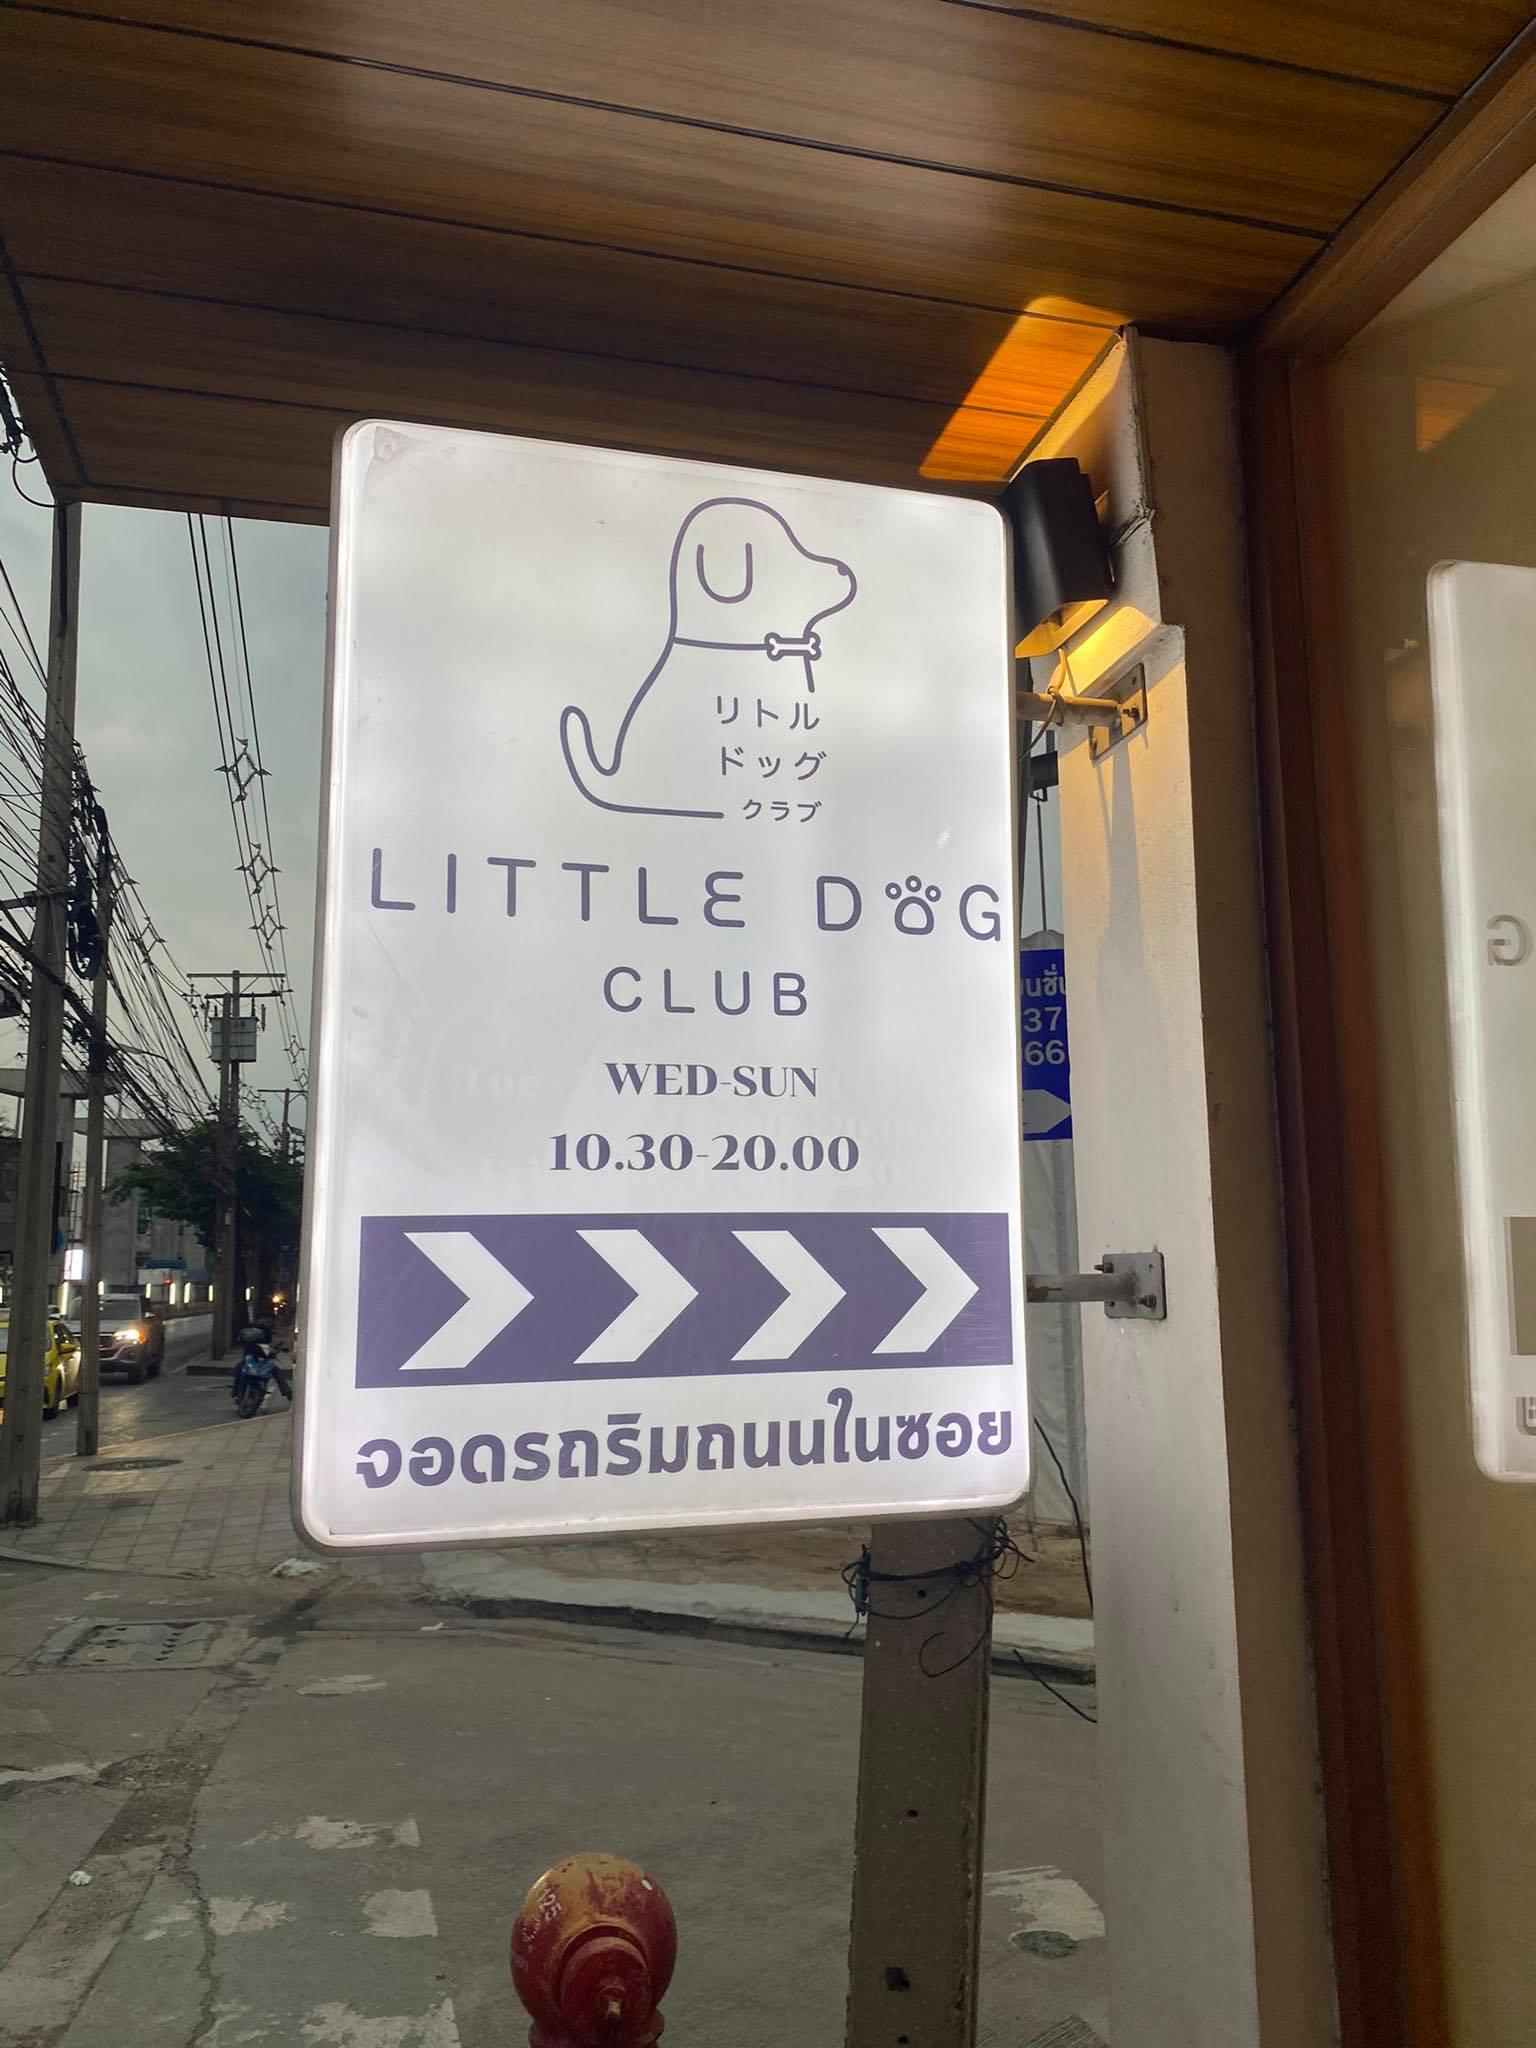 Dogilike.com :: Little Dog Club คาเฟ่น้องหมาตัวเล็กแนวมินิมอล !!